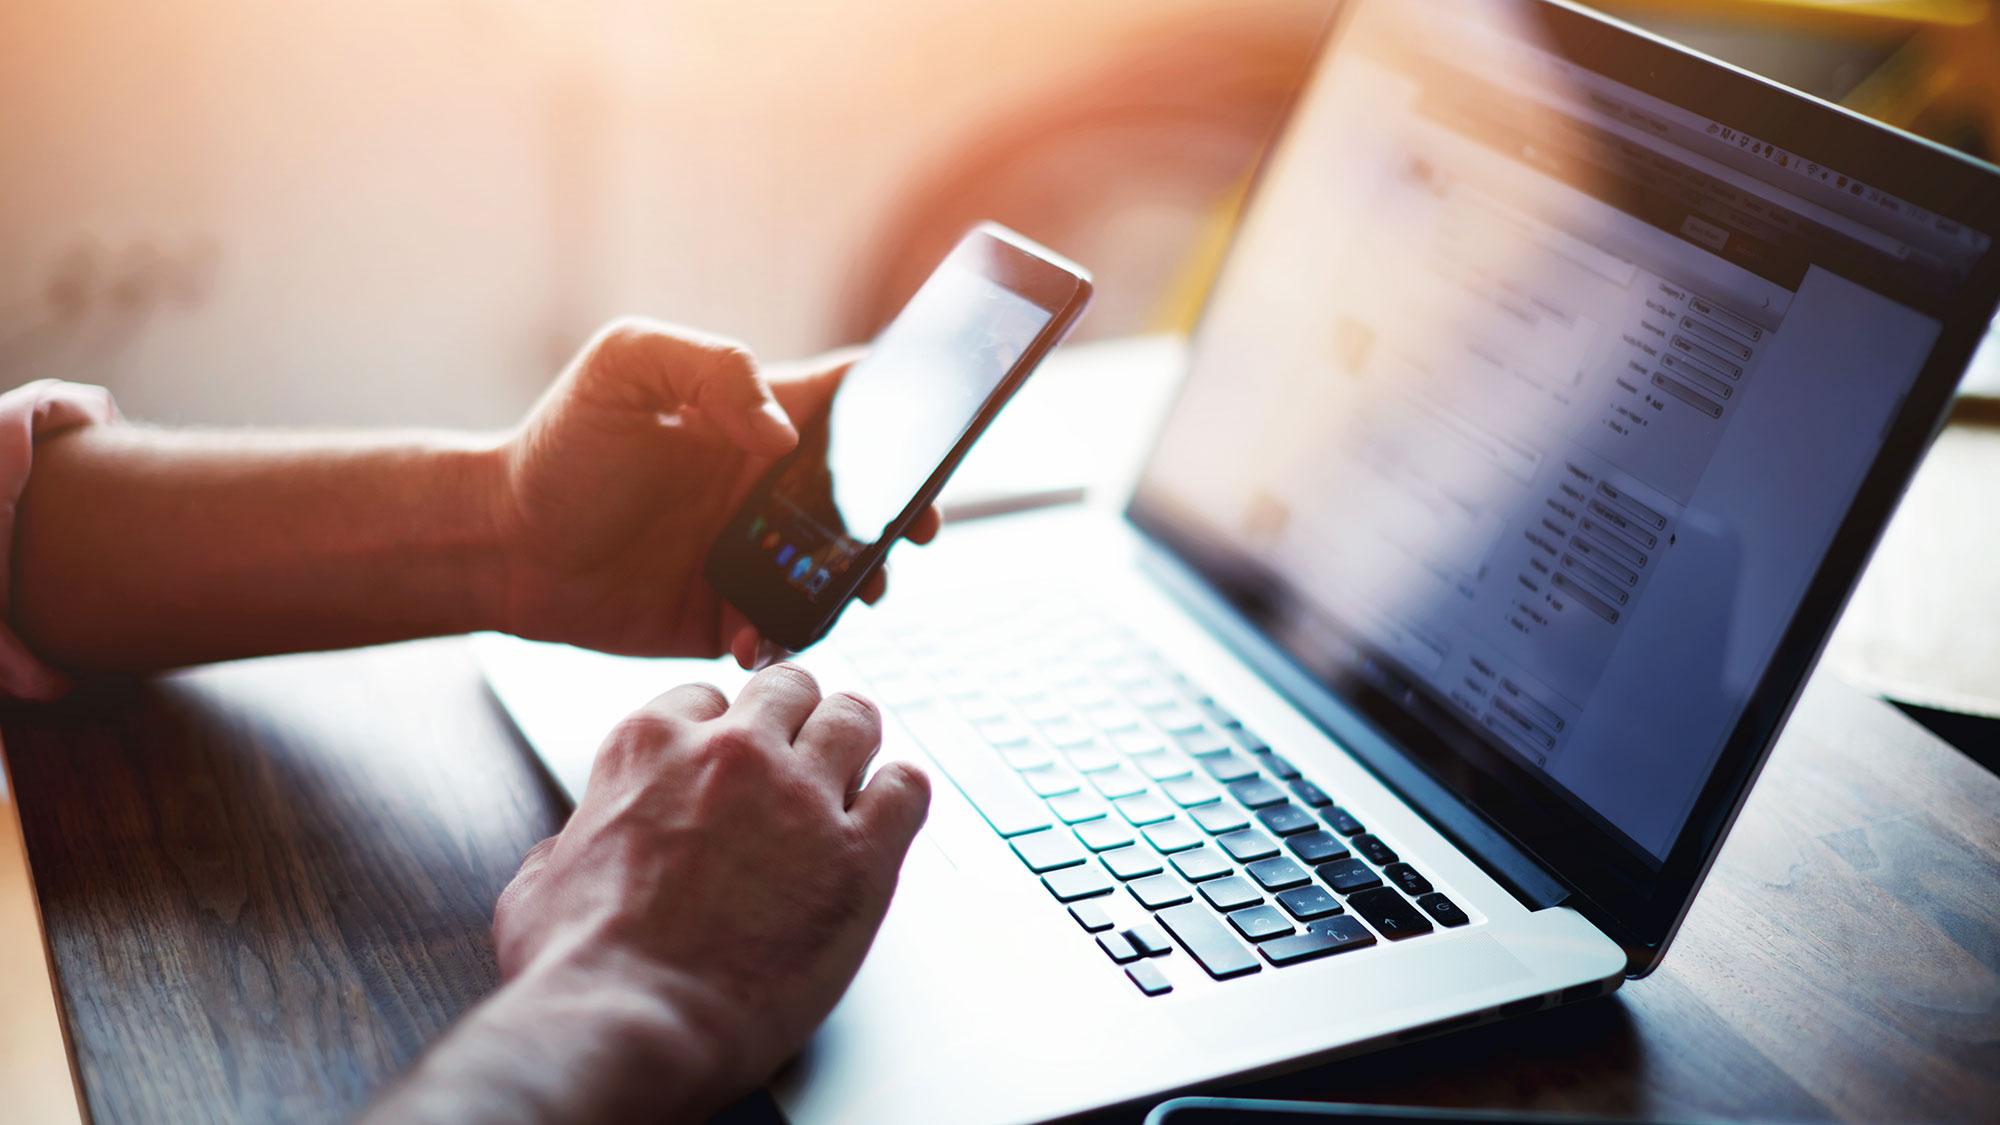 Digital technology resource asset protection